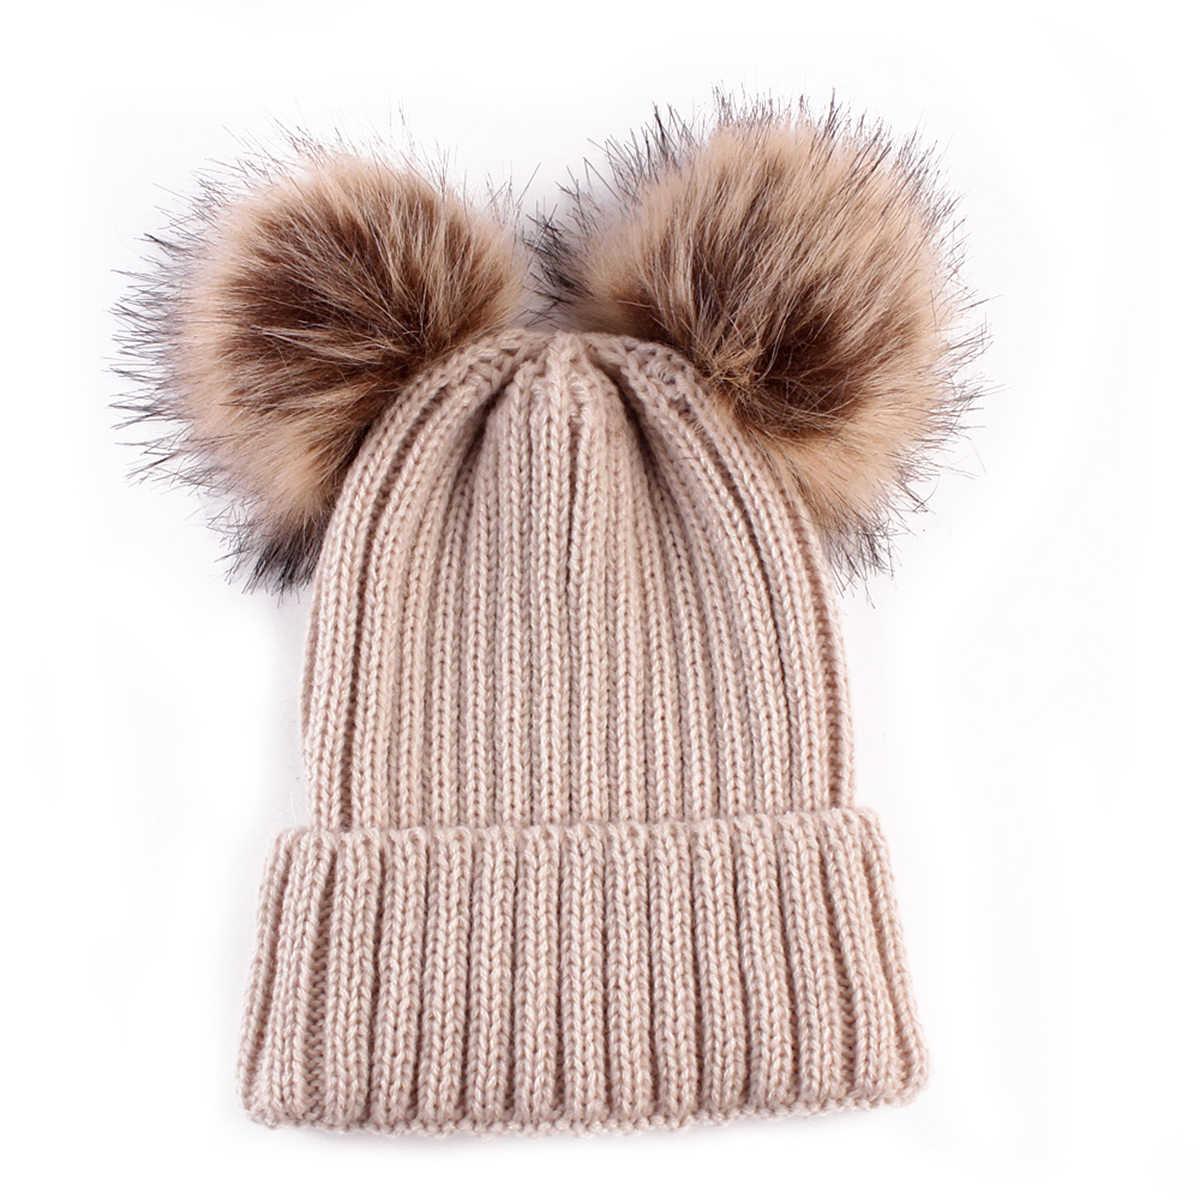 67168d8f6f9 ... Baby Boy girl Winter Warm Knit Beanie Hat Winter infant Hat Double  Pompom Hats Fur Ball